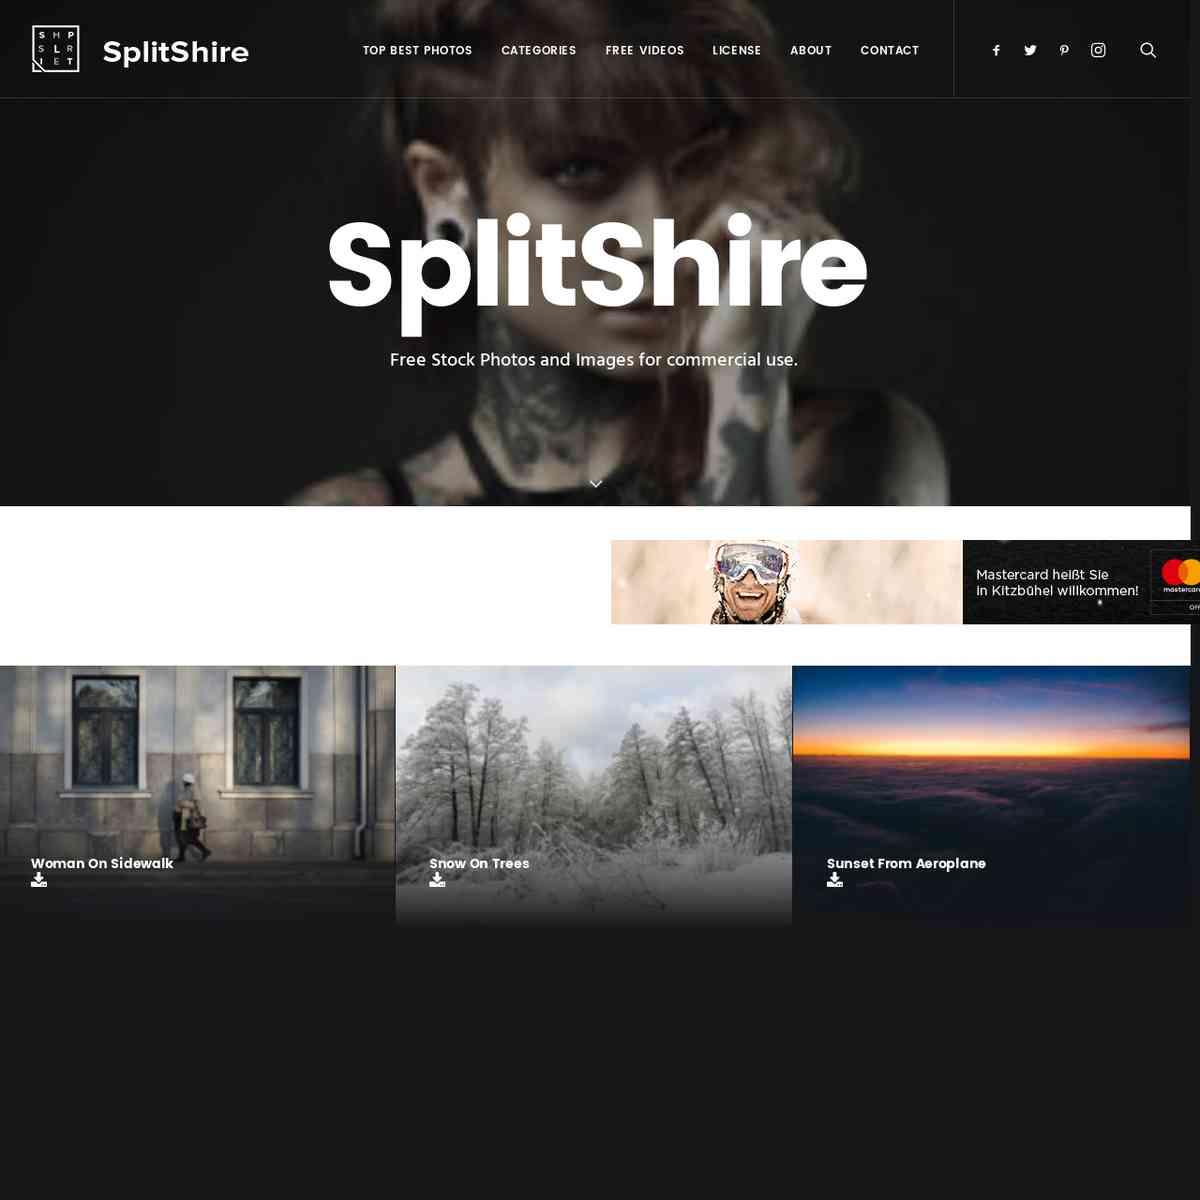 Free Stock Photos & Videos - SplitShire